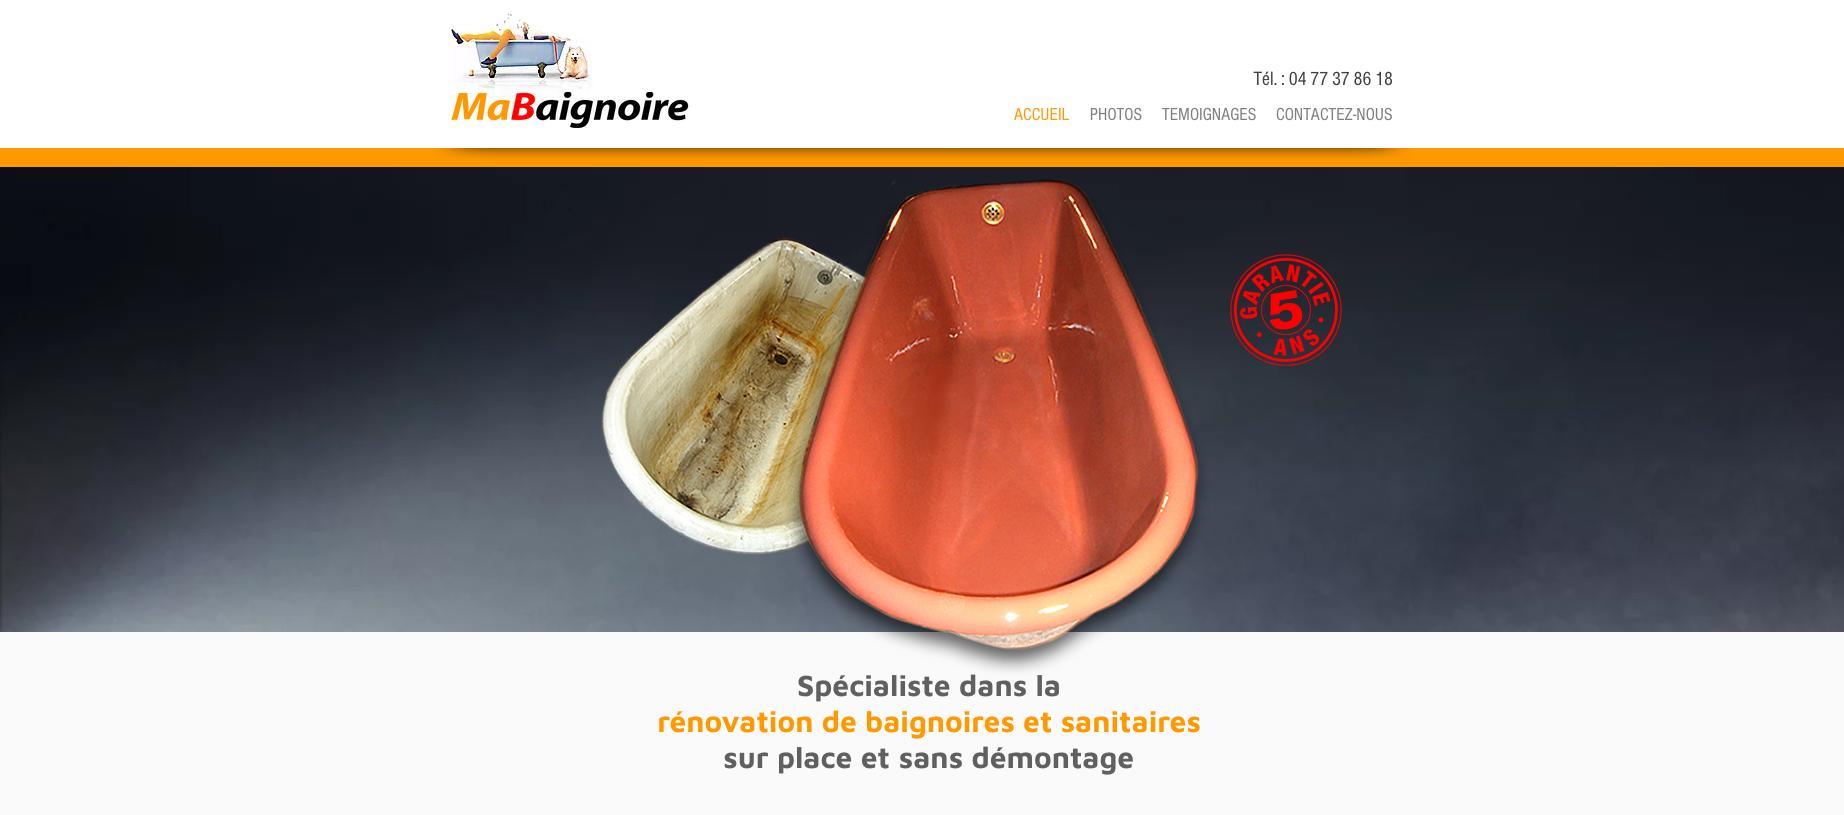 Reemaillage De Baignoires Mabaignoire France